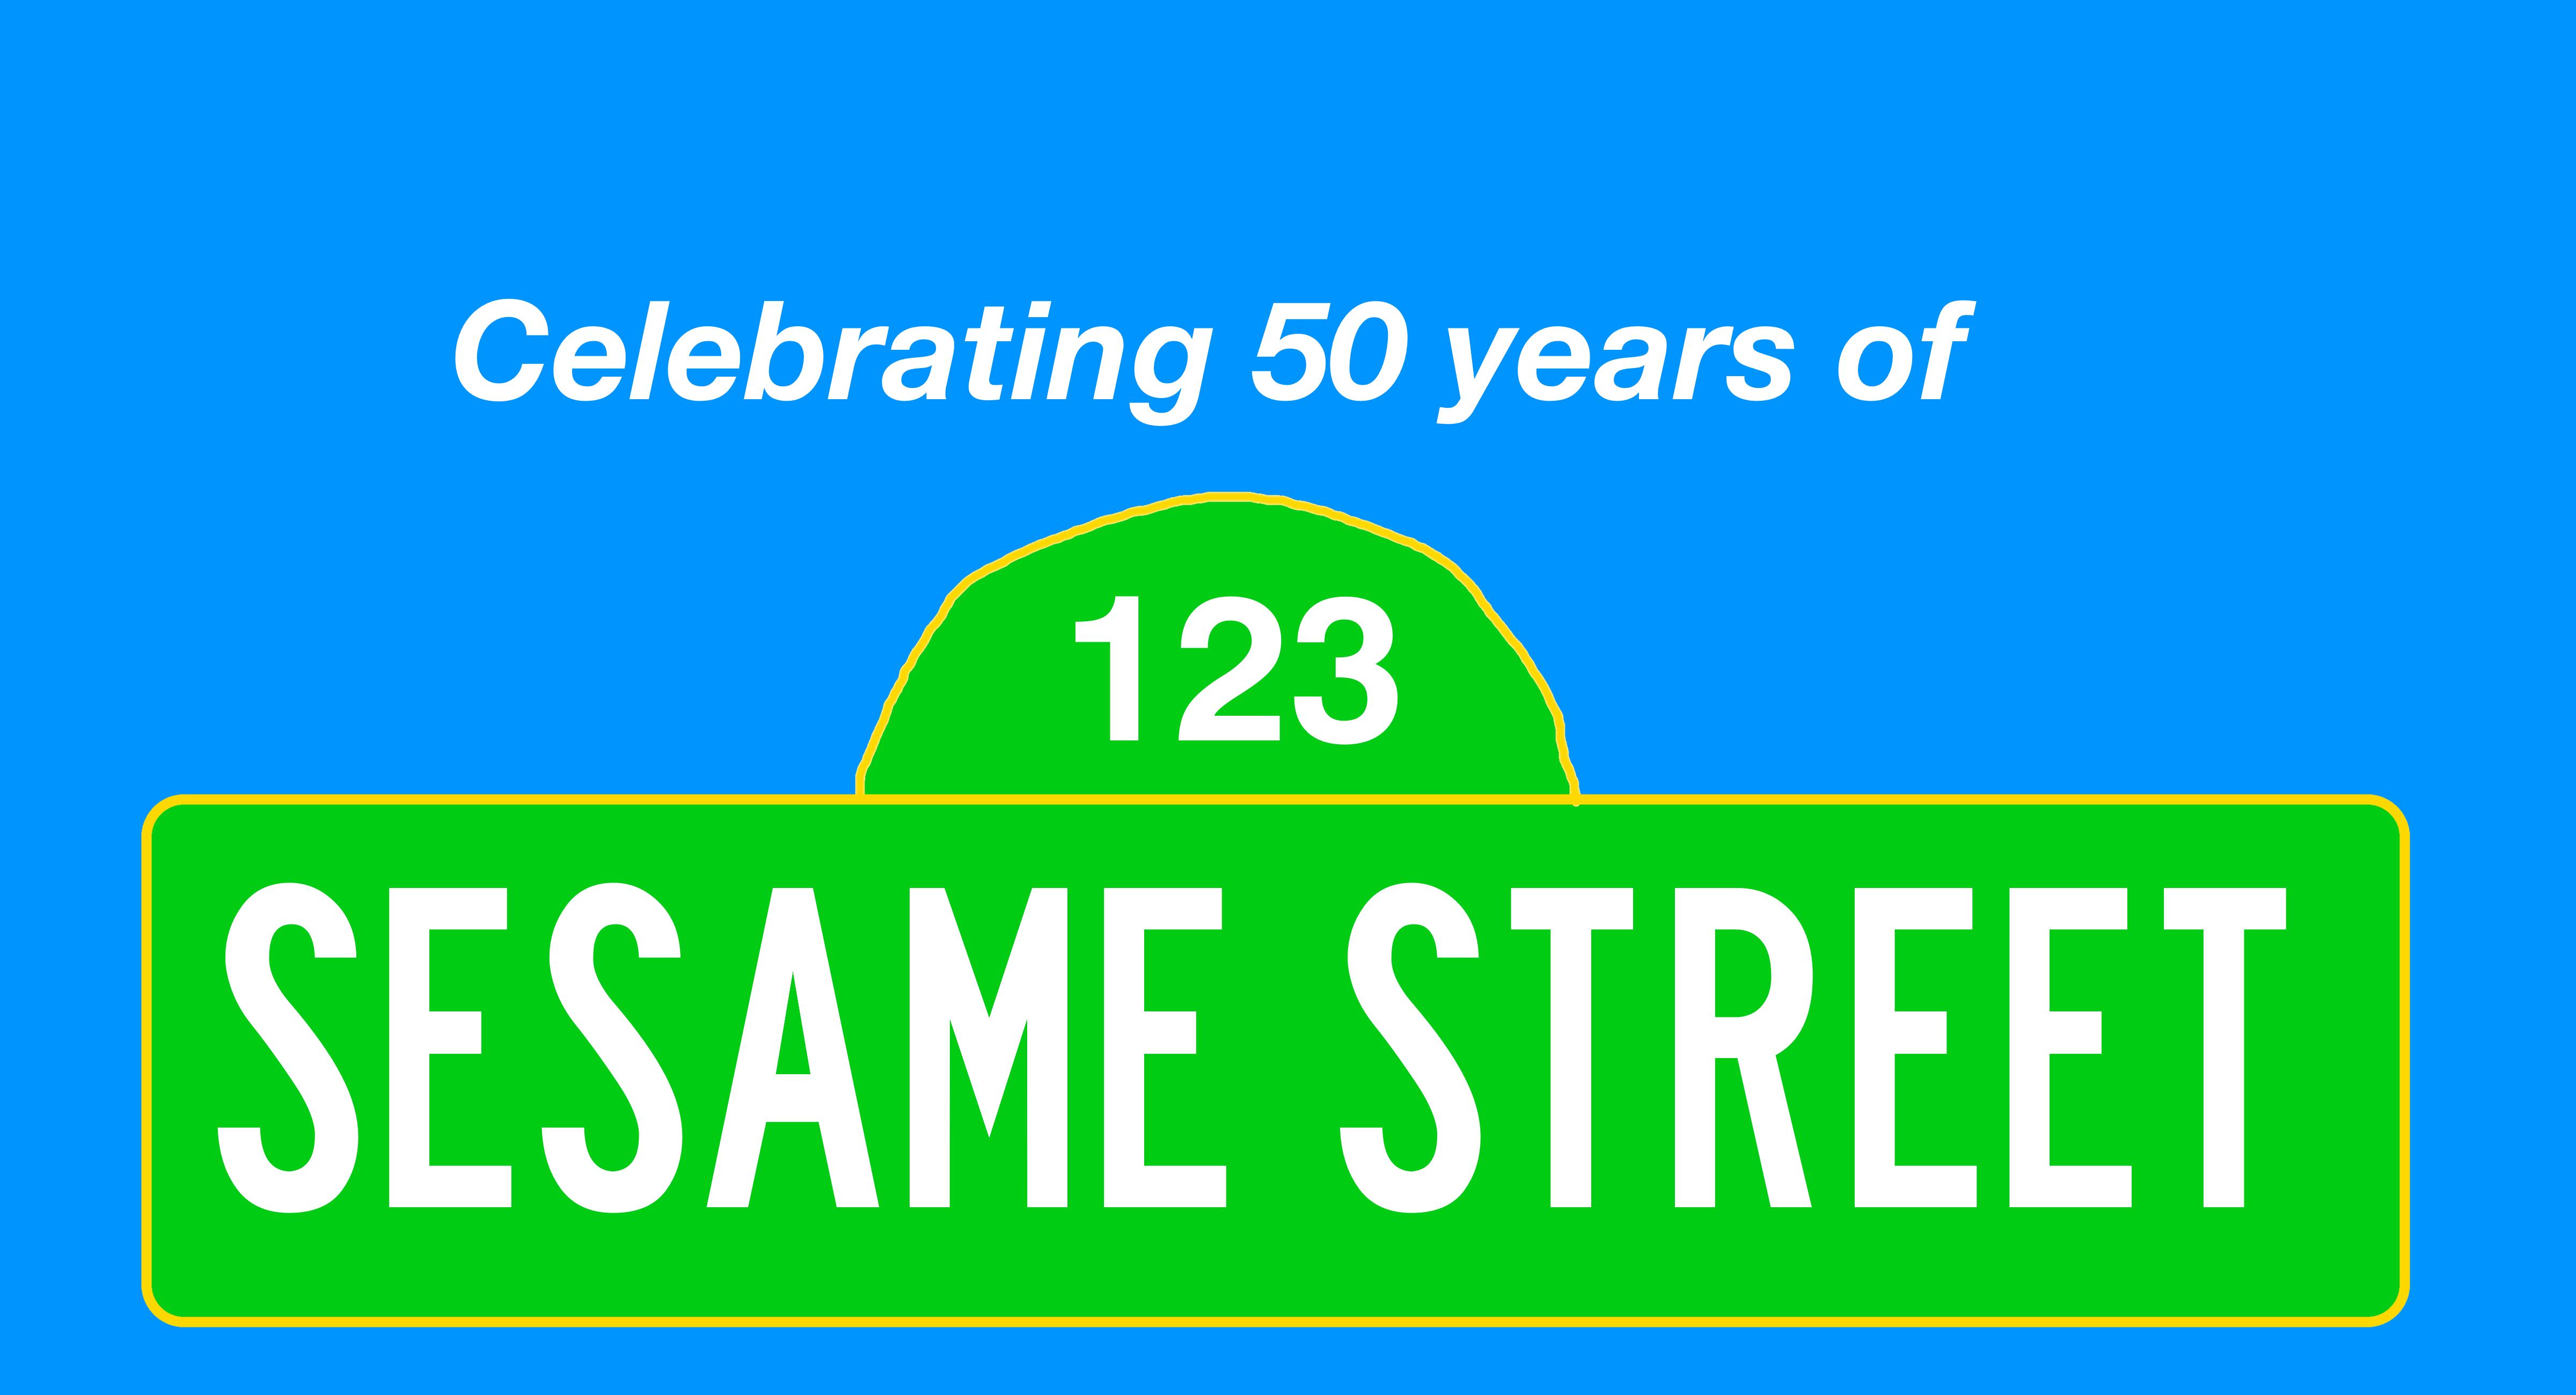 50 Years of Sesame Street by MikeJEddyNSGamer89 on DeviantArt